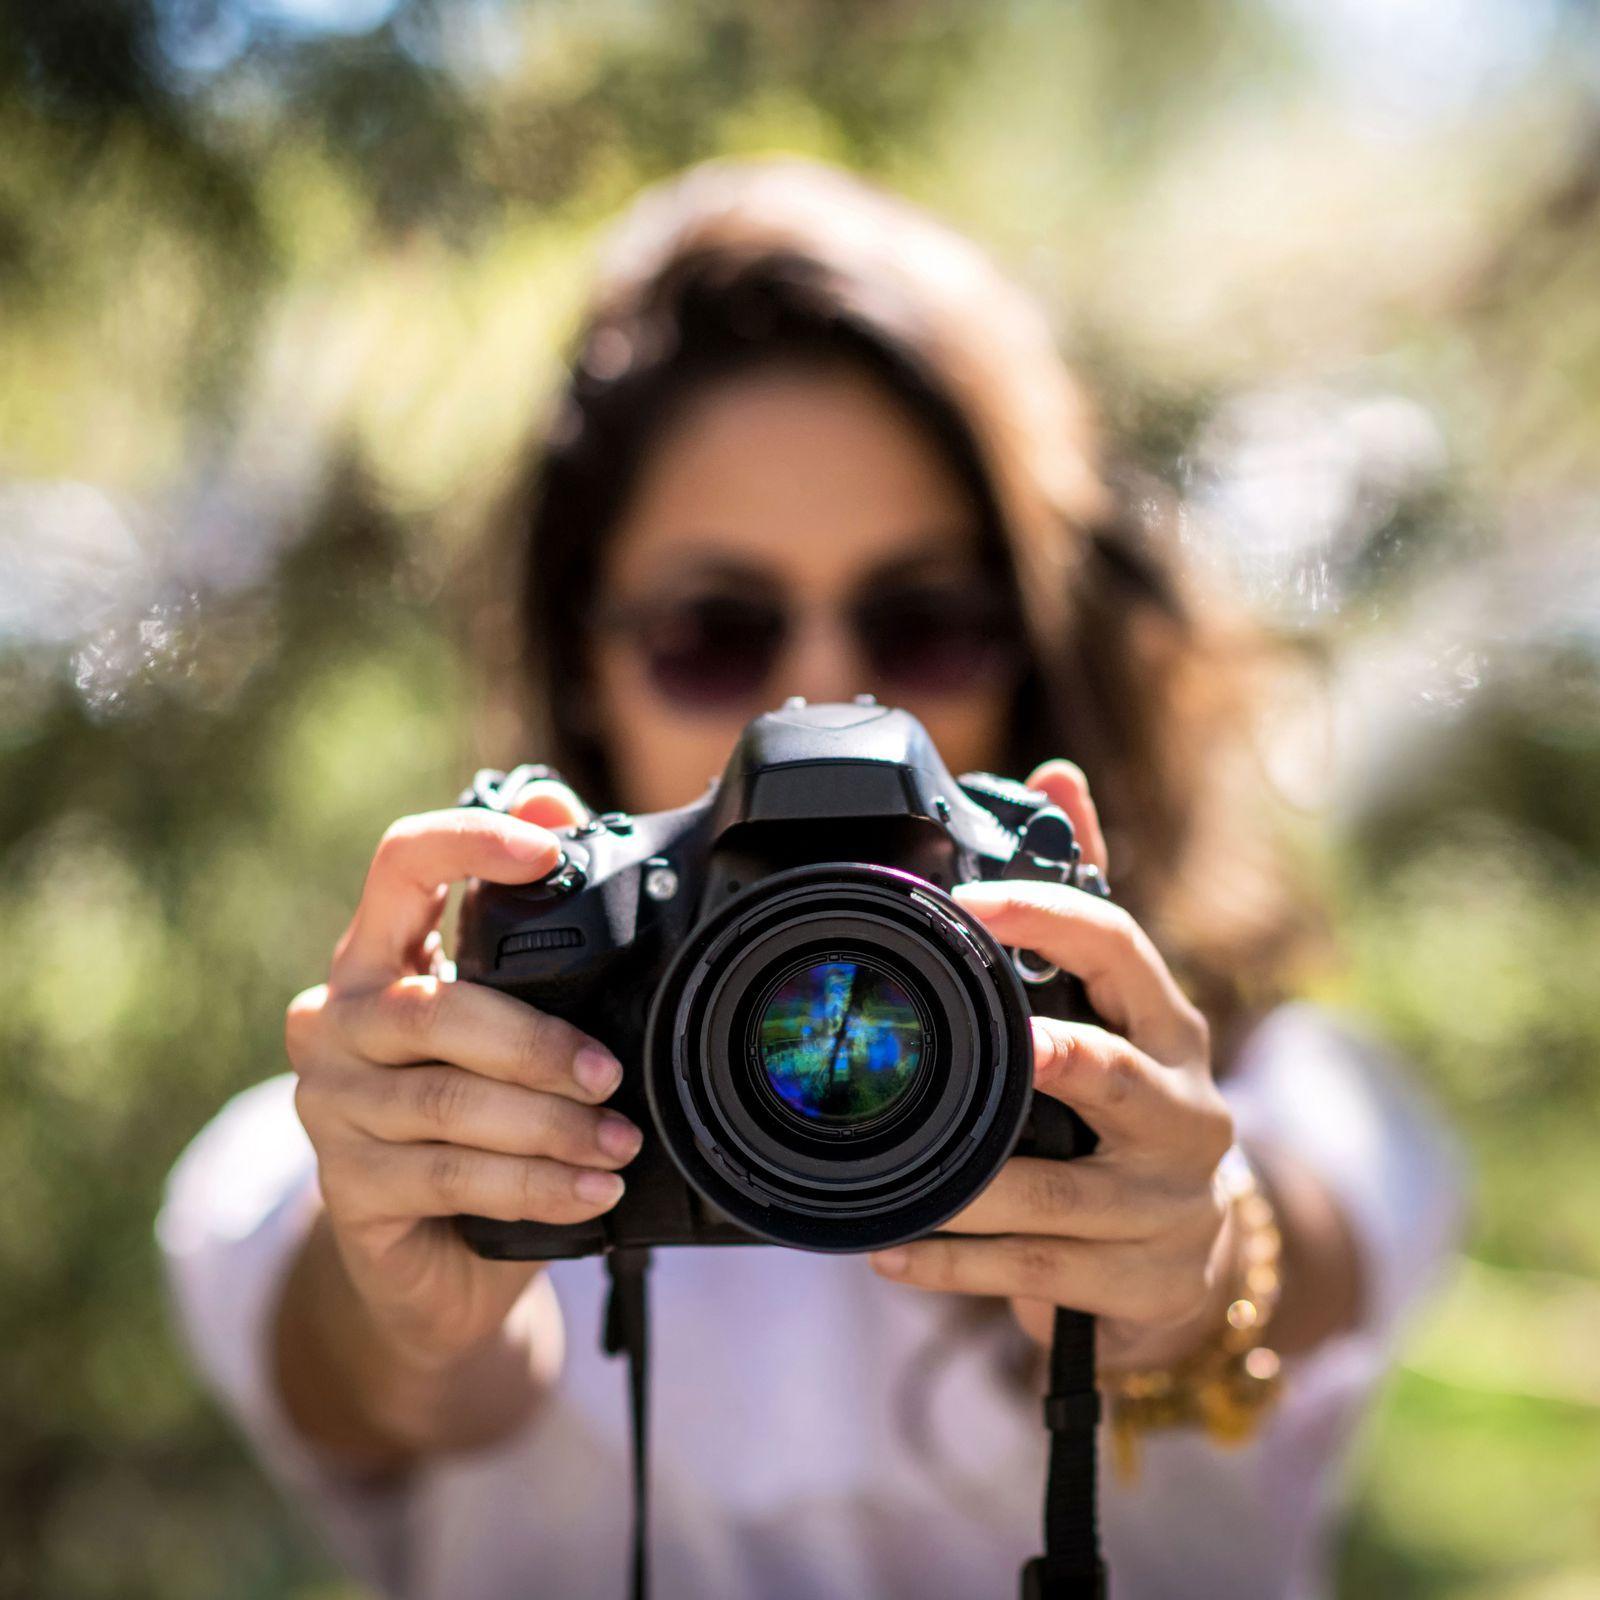 Best Dslr Cameras The Top 7 Beginner And Intermediate Cameras Dslr Photography Tips Best Dslr Photography Gear Diy